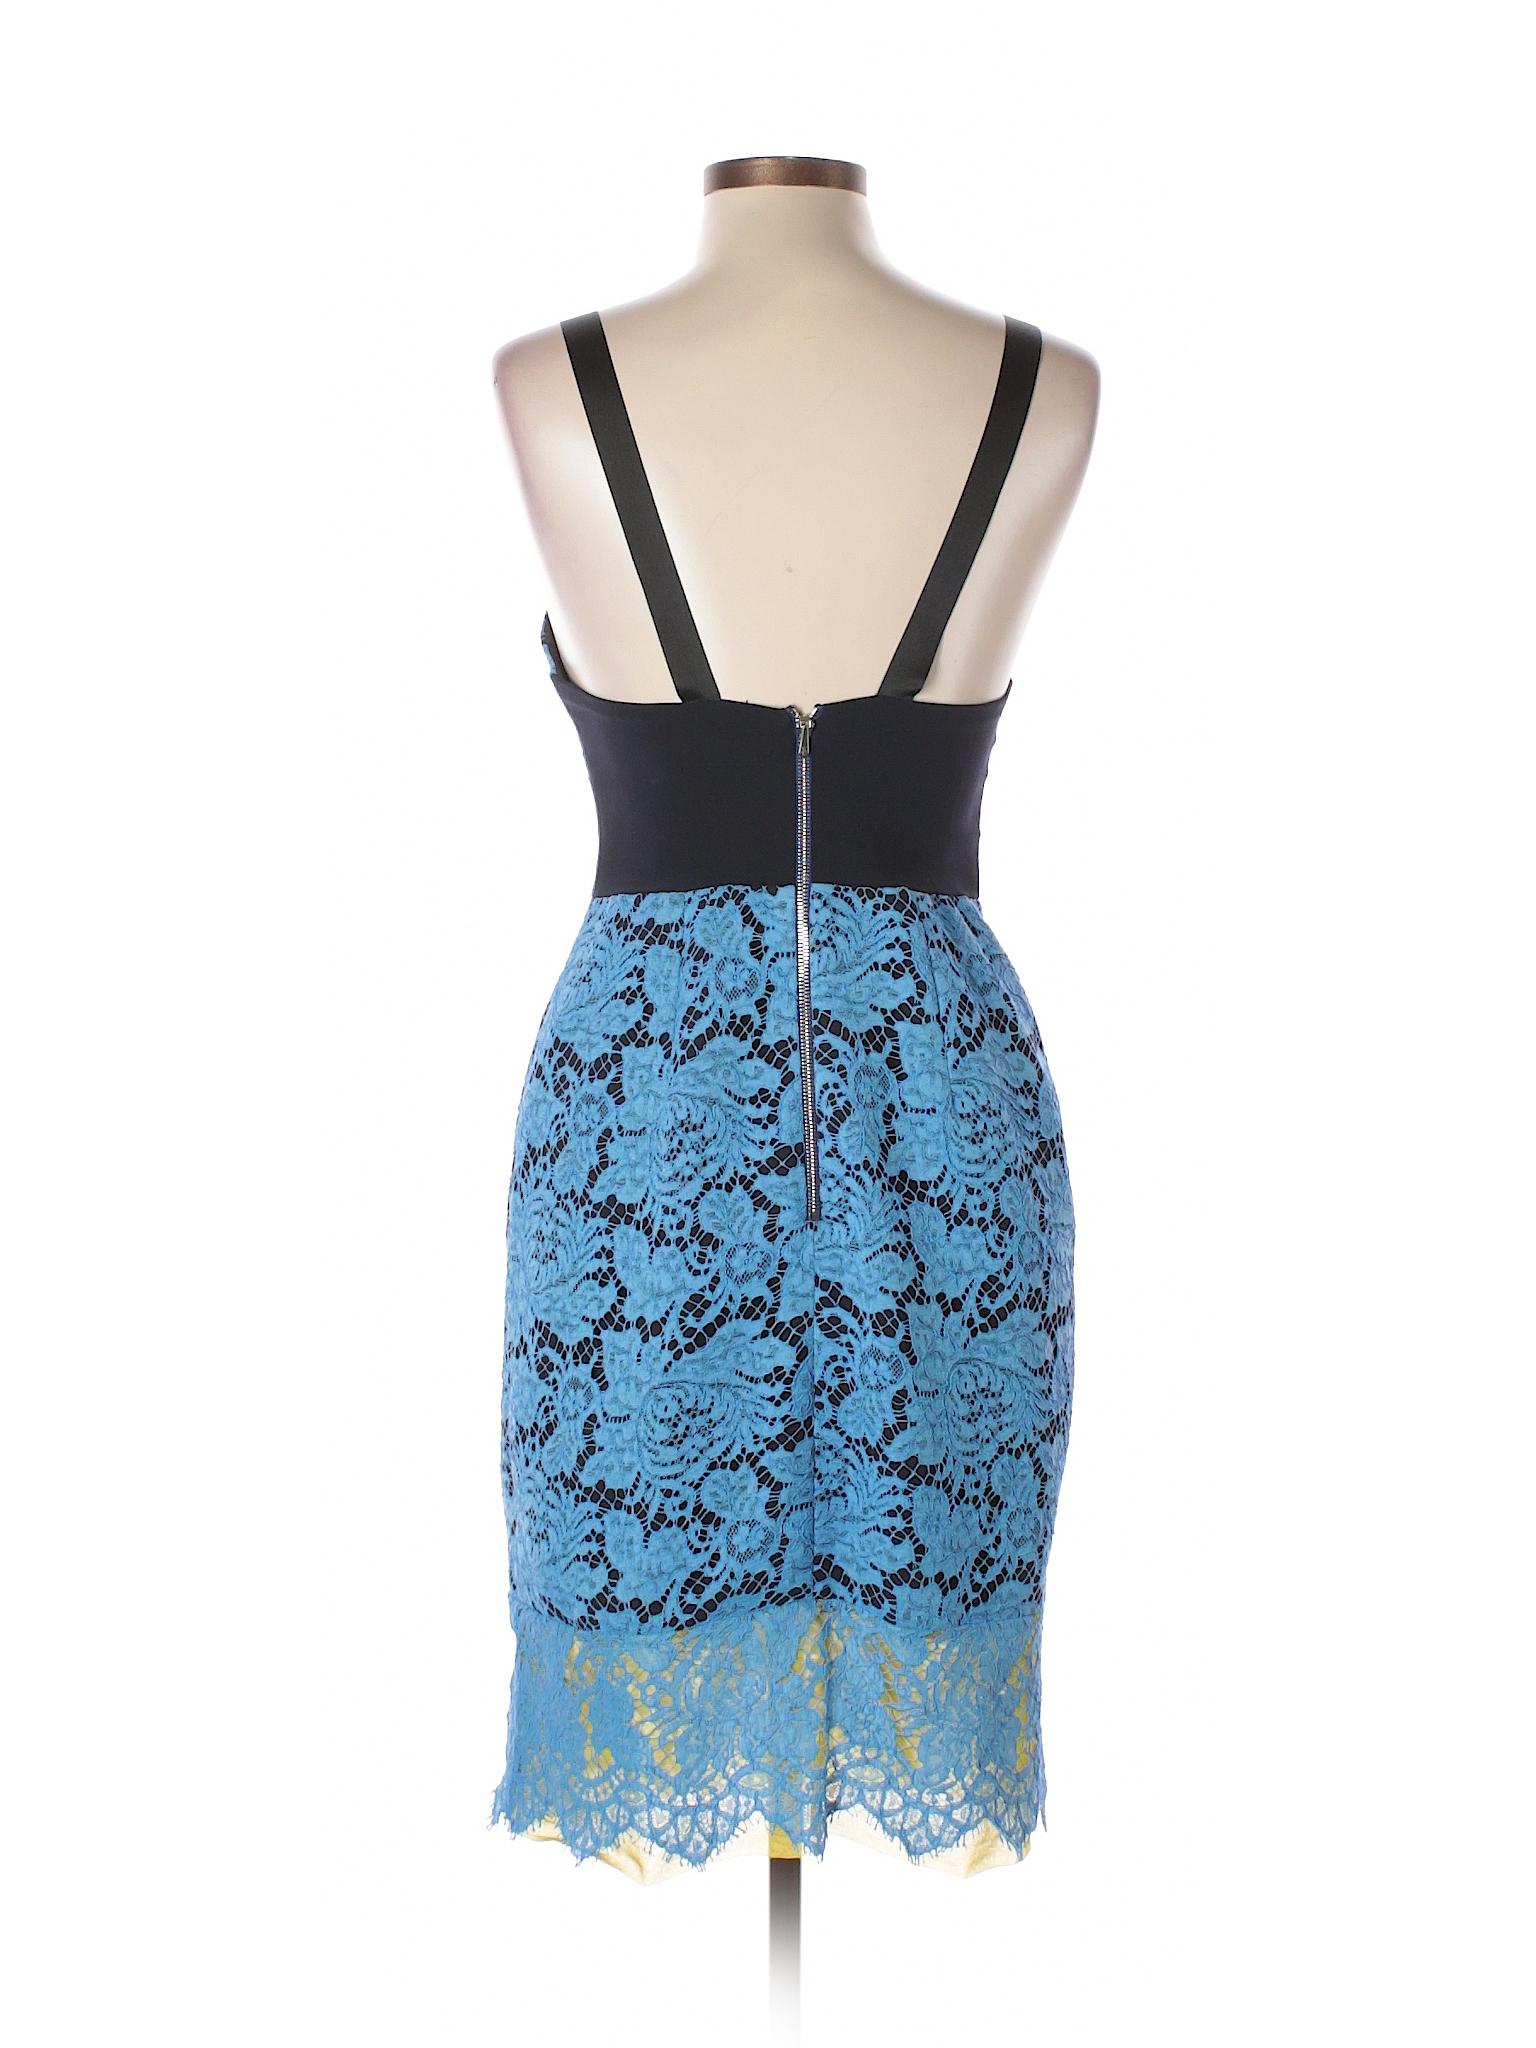 by Casual Preen Bregazzi Dress Selling Thornton OaHqxU5